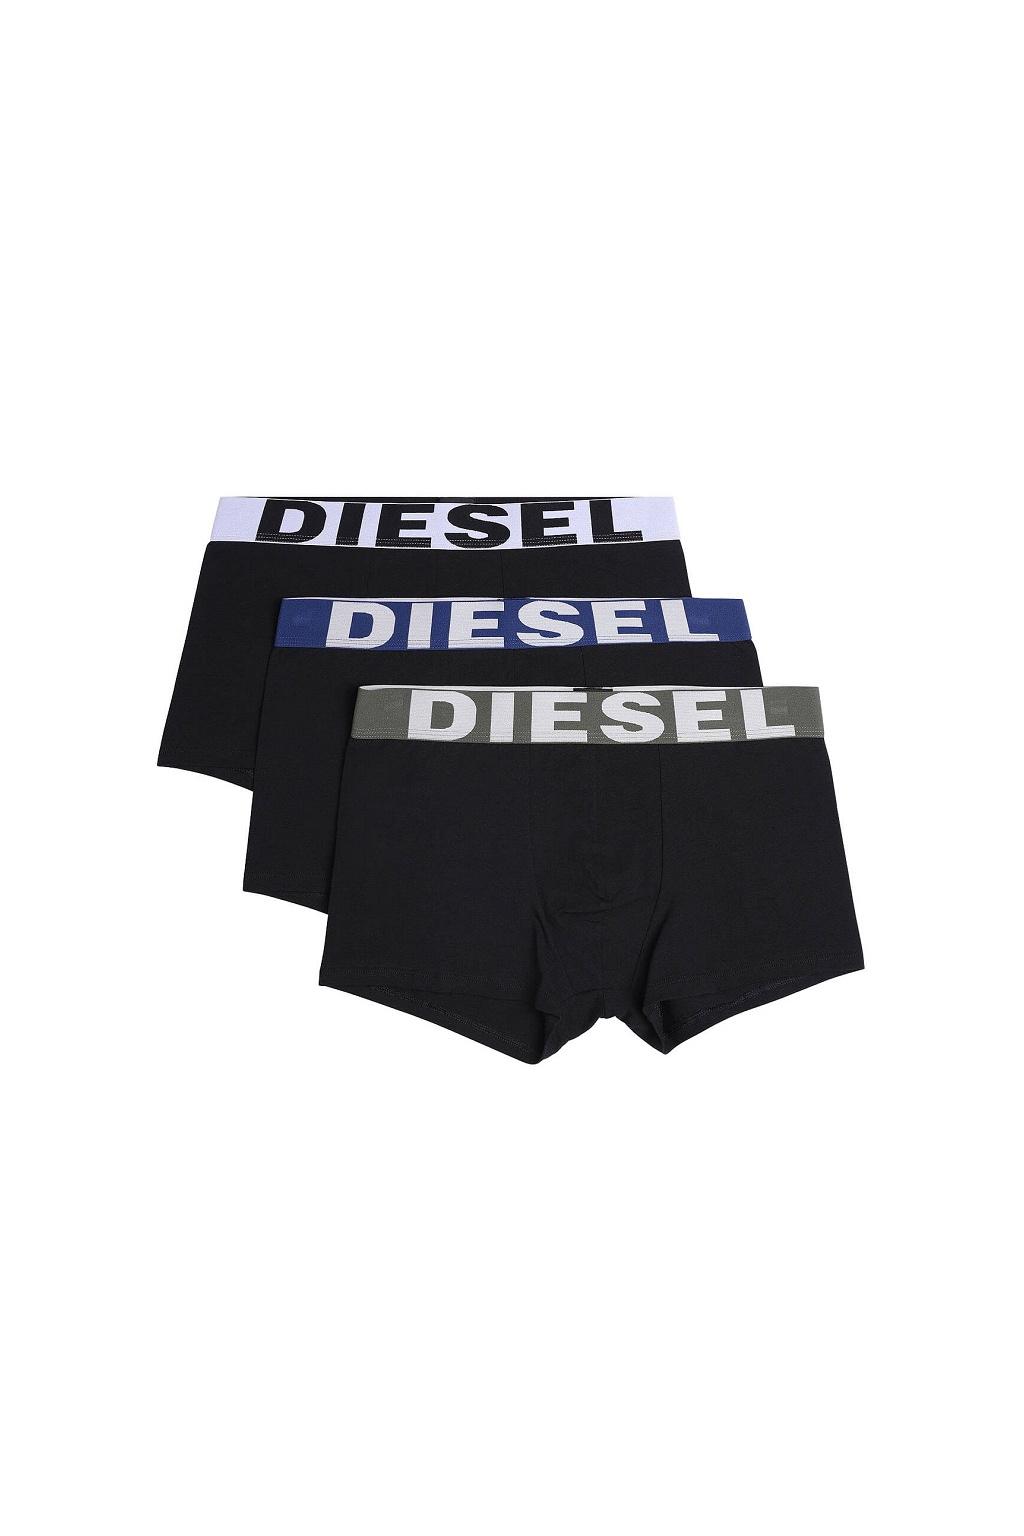 00SAB2 0GAPG Diesel boxerky Umbx Shawnthreepack 3Pack černé